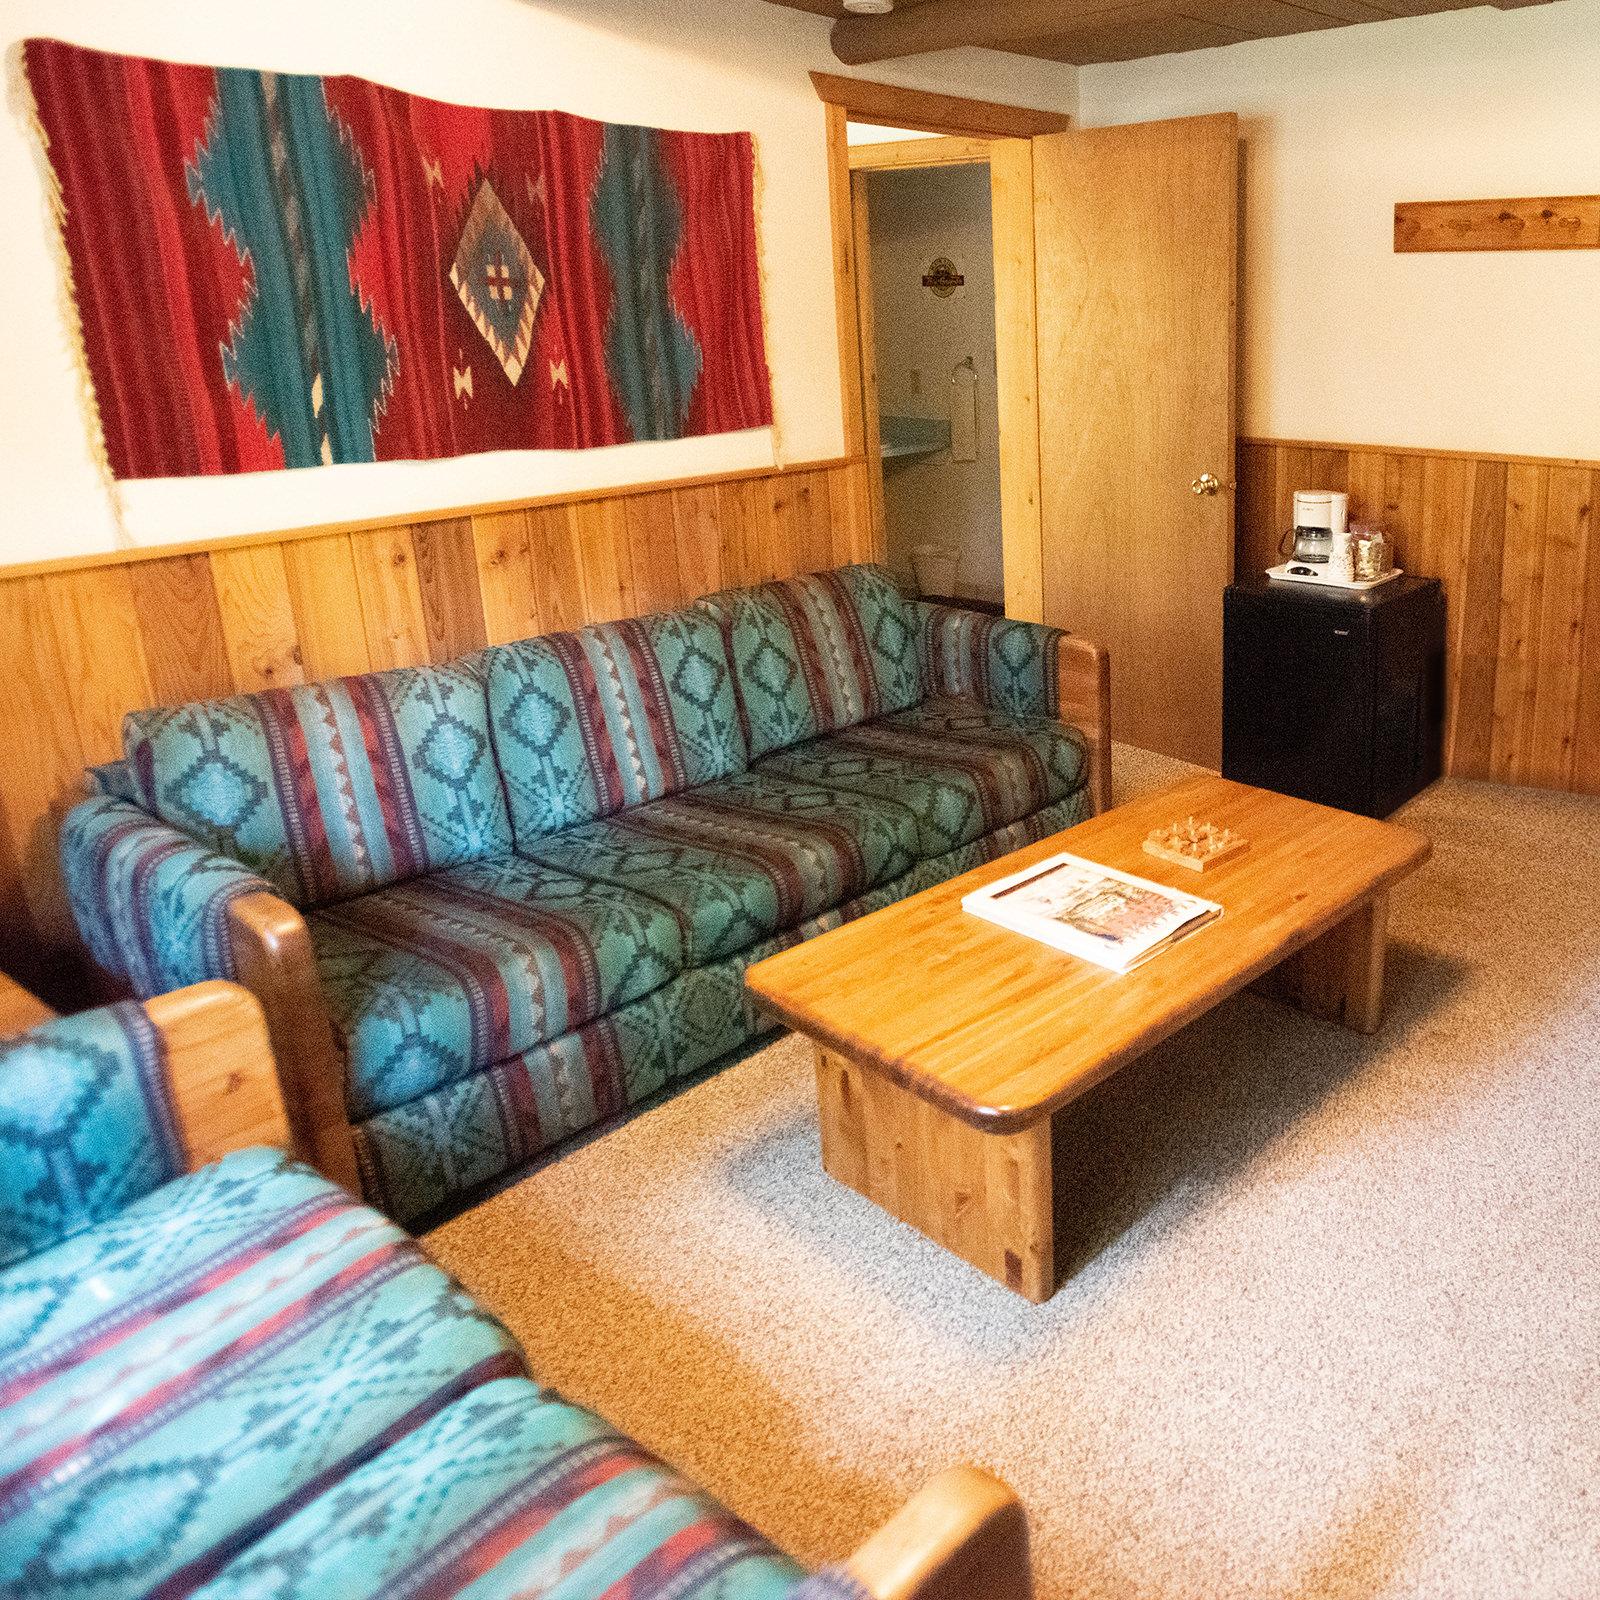 A cozy cabin living room